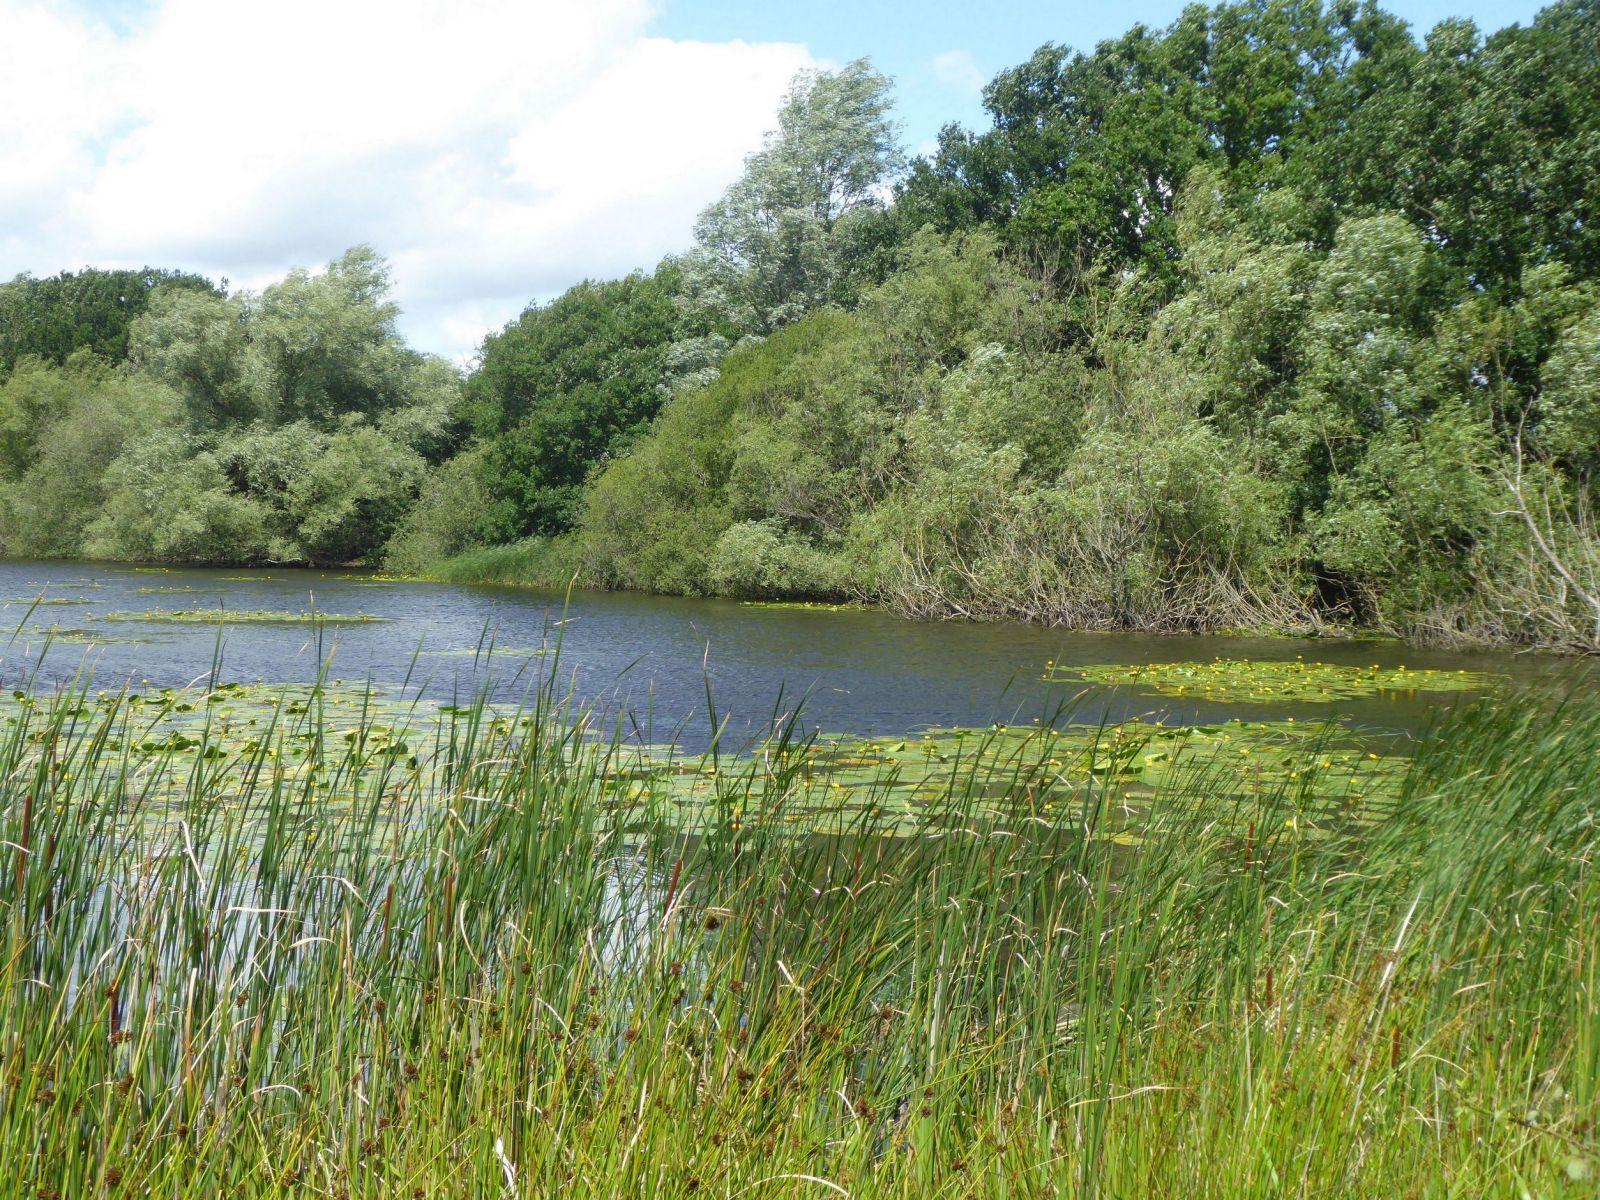 Applehurst Pond, Thorpe Marsh